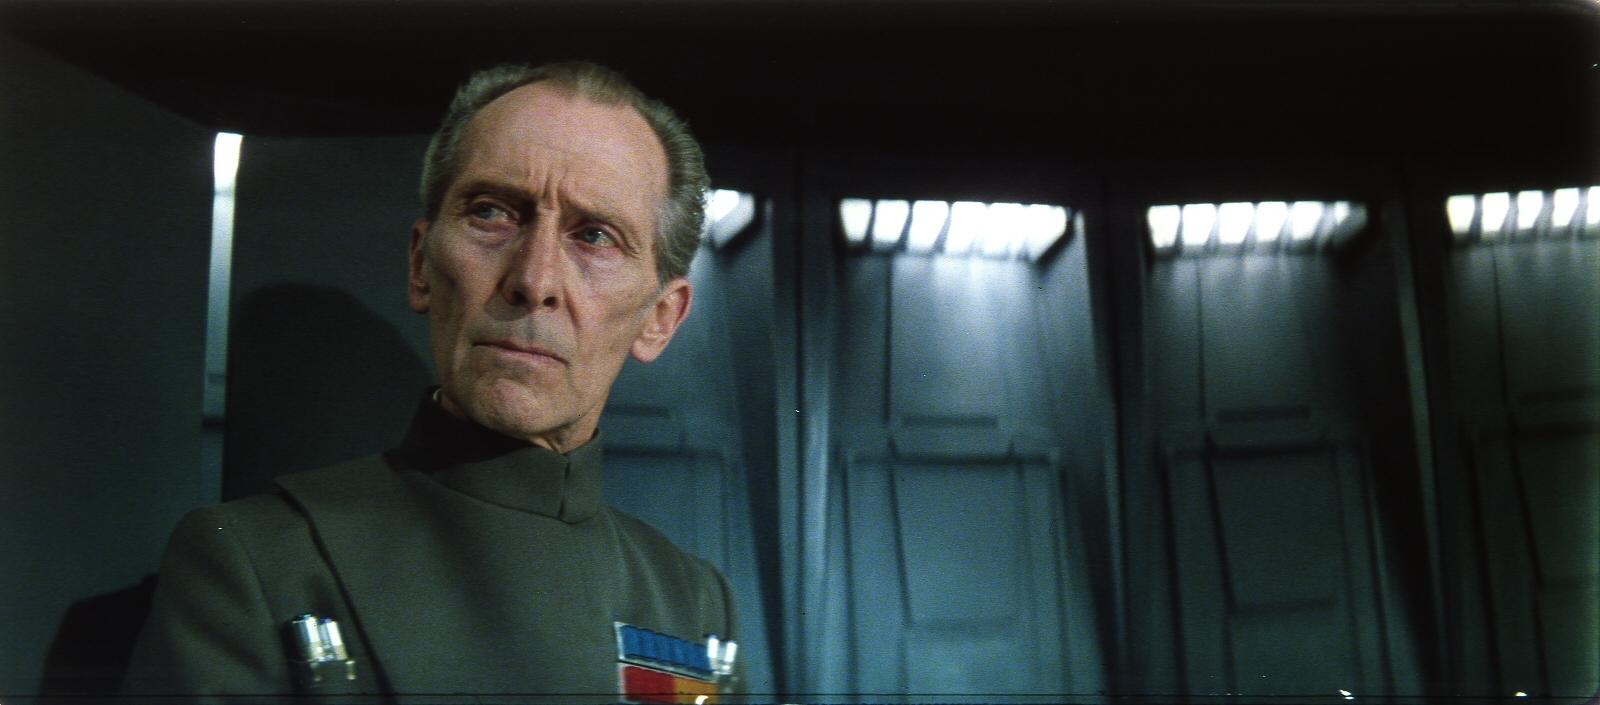 star-wars-movies-grand-moff-tarkin-peter-cushing-283611-52.jpg